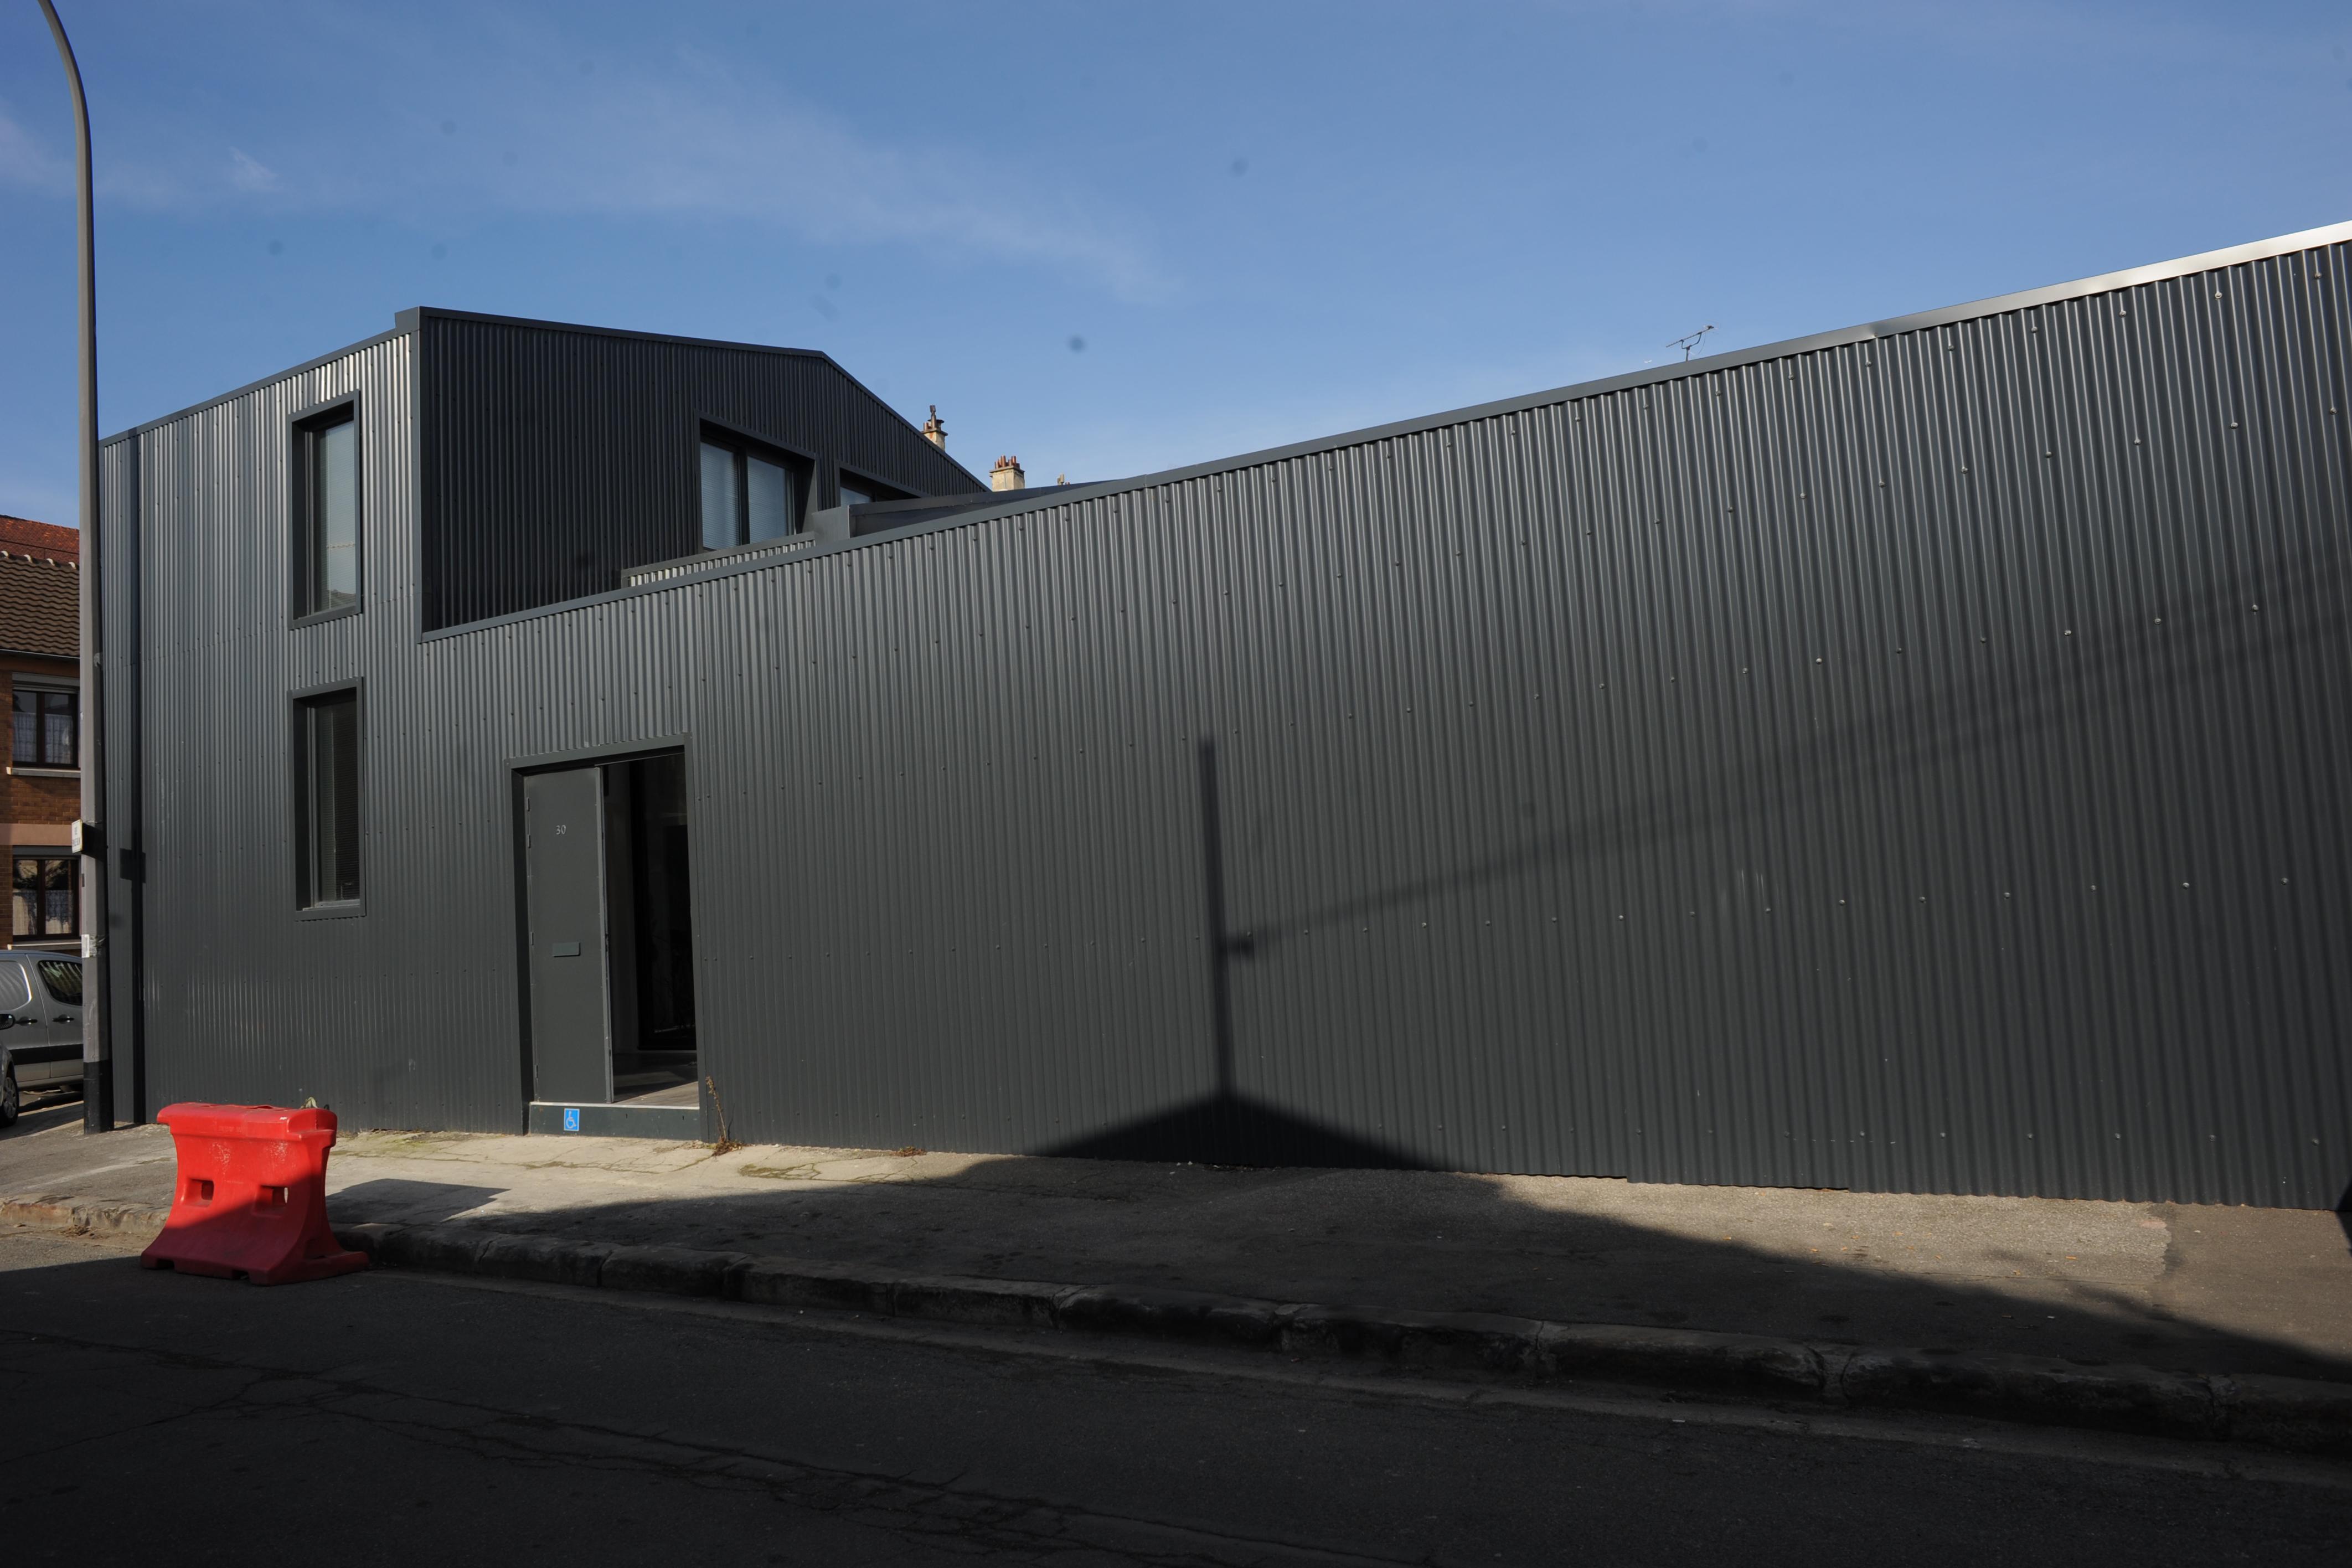 The Studio in Ivry